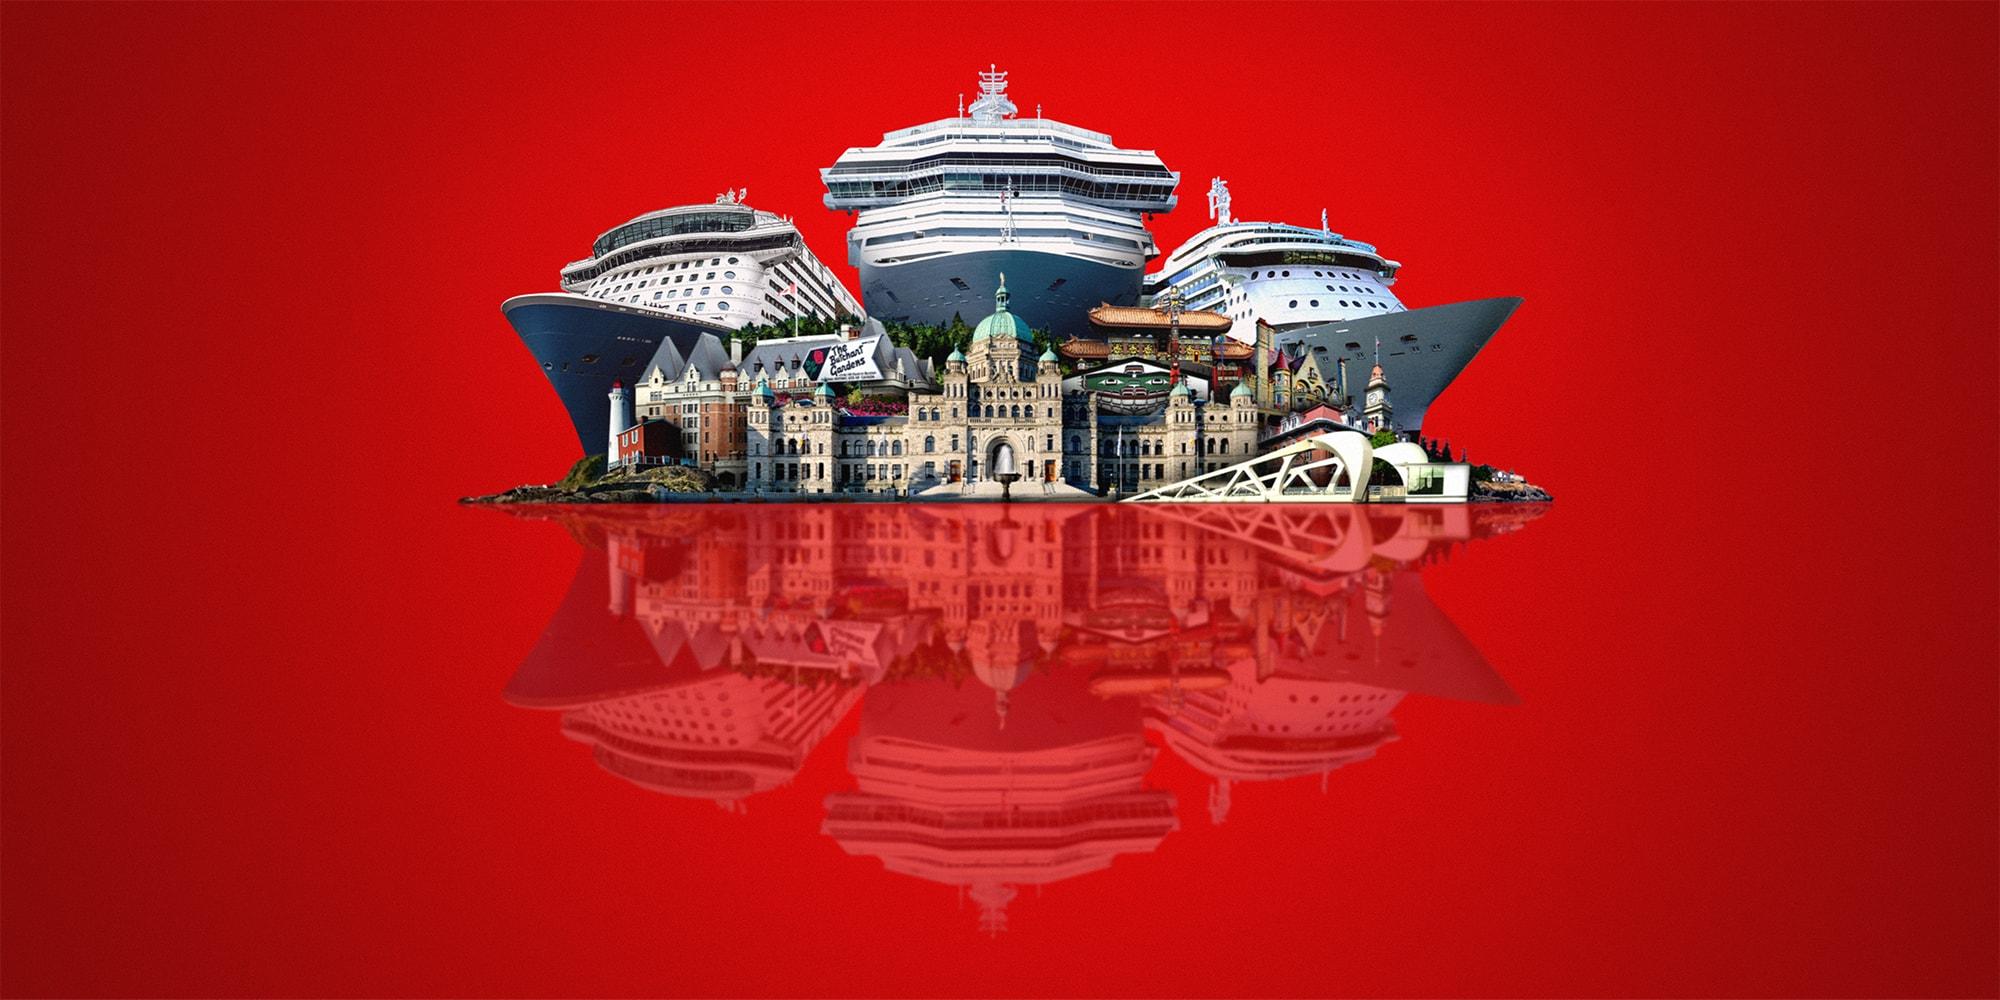 Victoria's Cruise Ship Conundrum